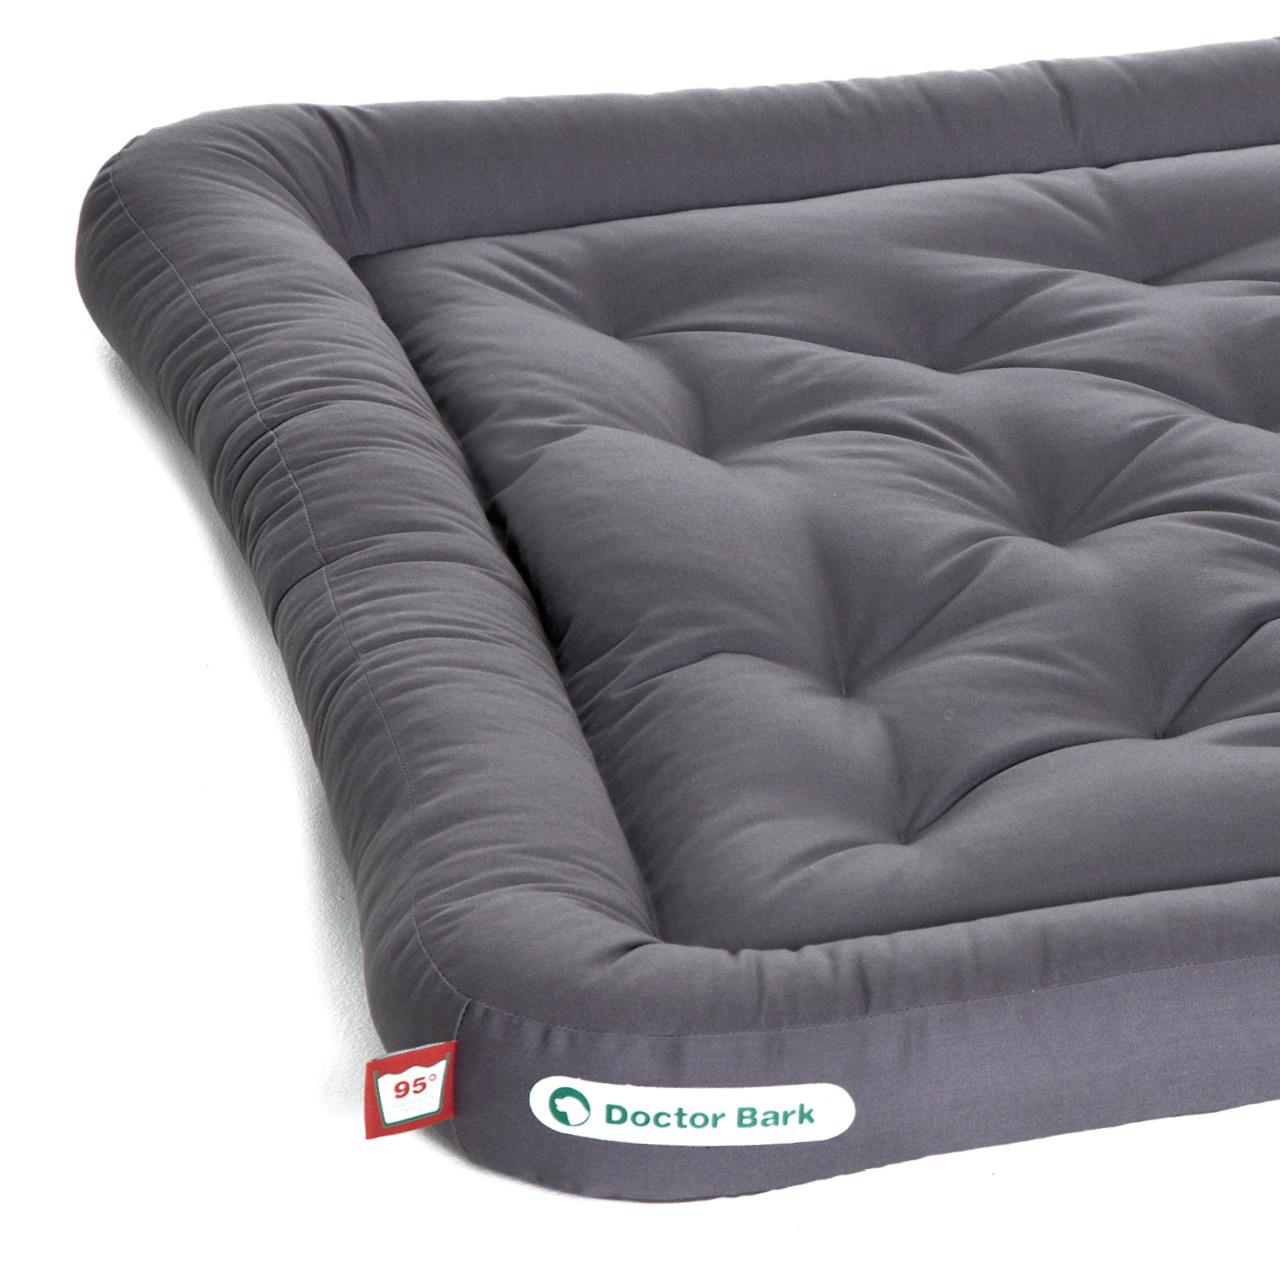 Lounge-Hundekissen / Hundebett orthopädisch Doctor Bark waschbar grau